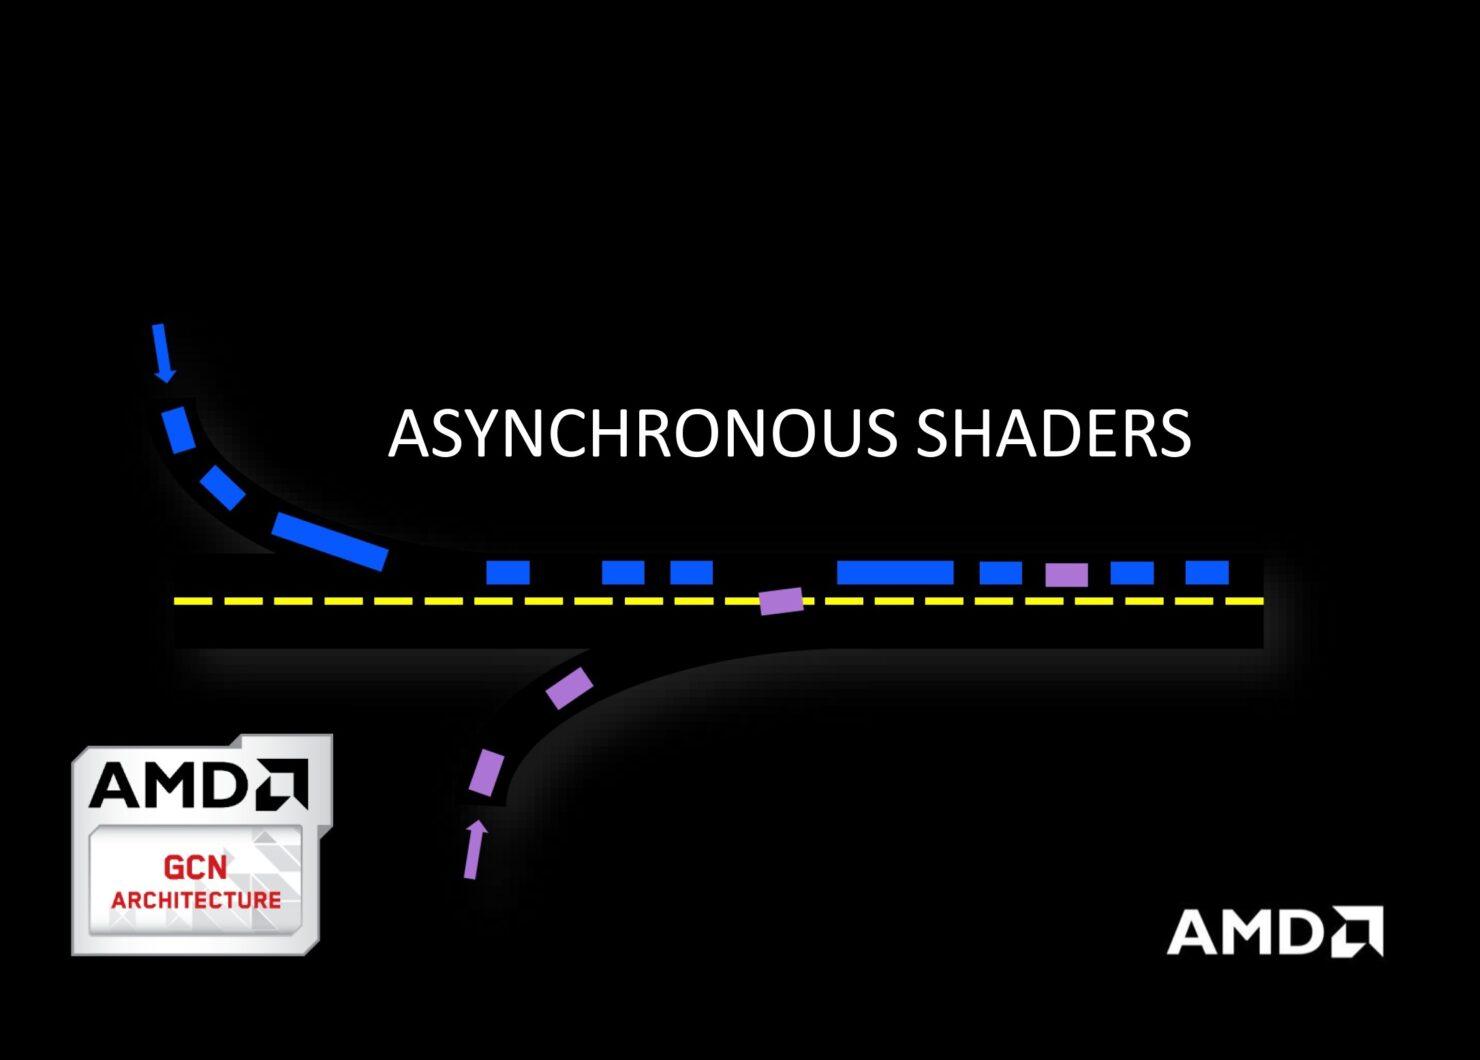 amd-async-shaders